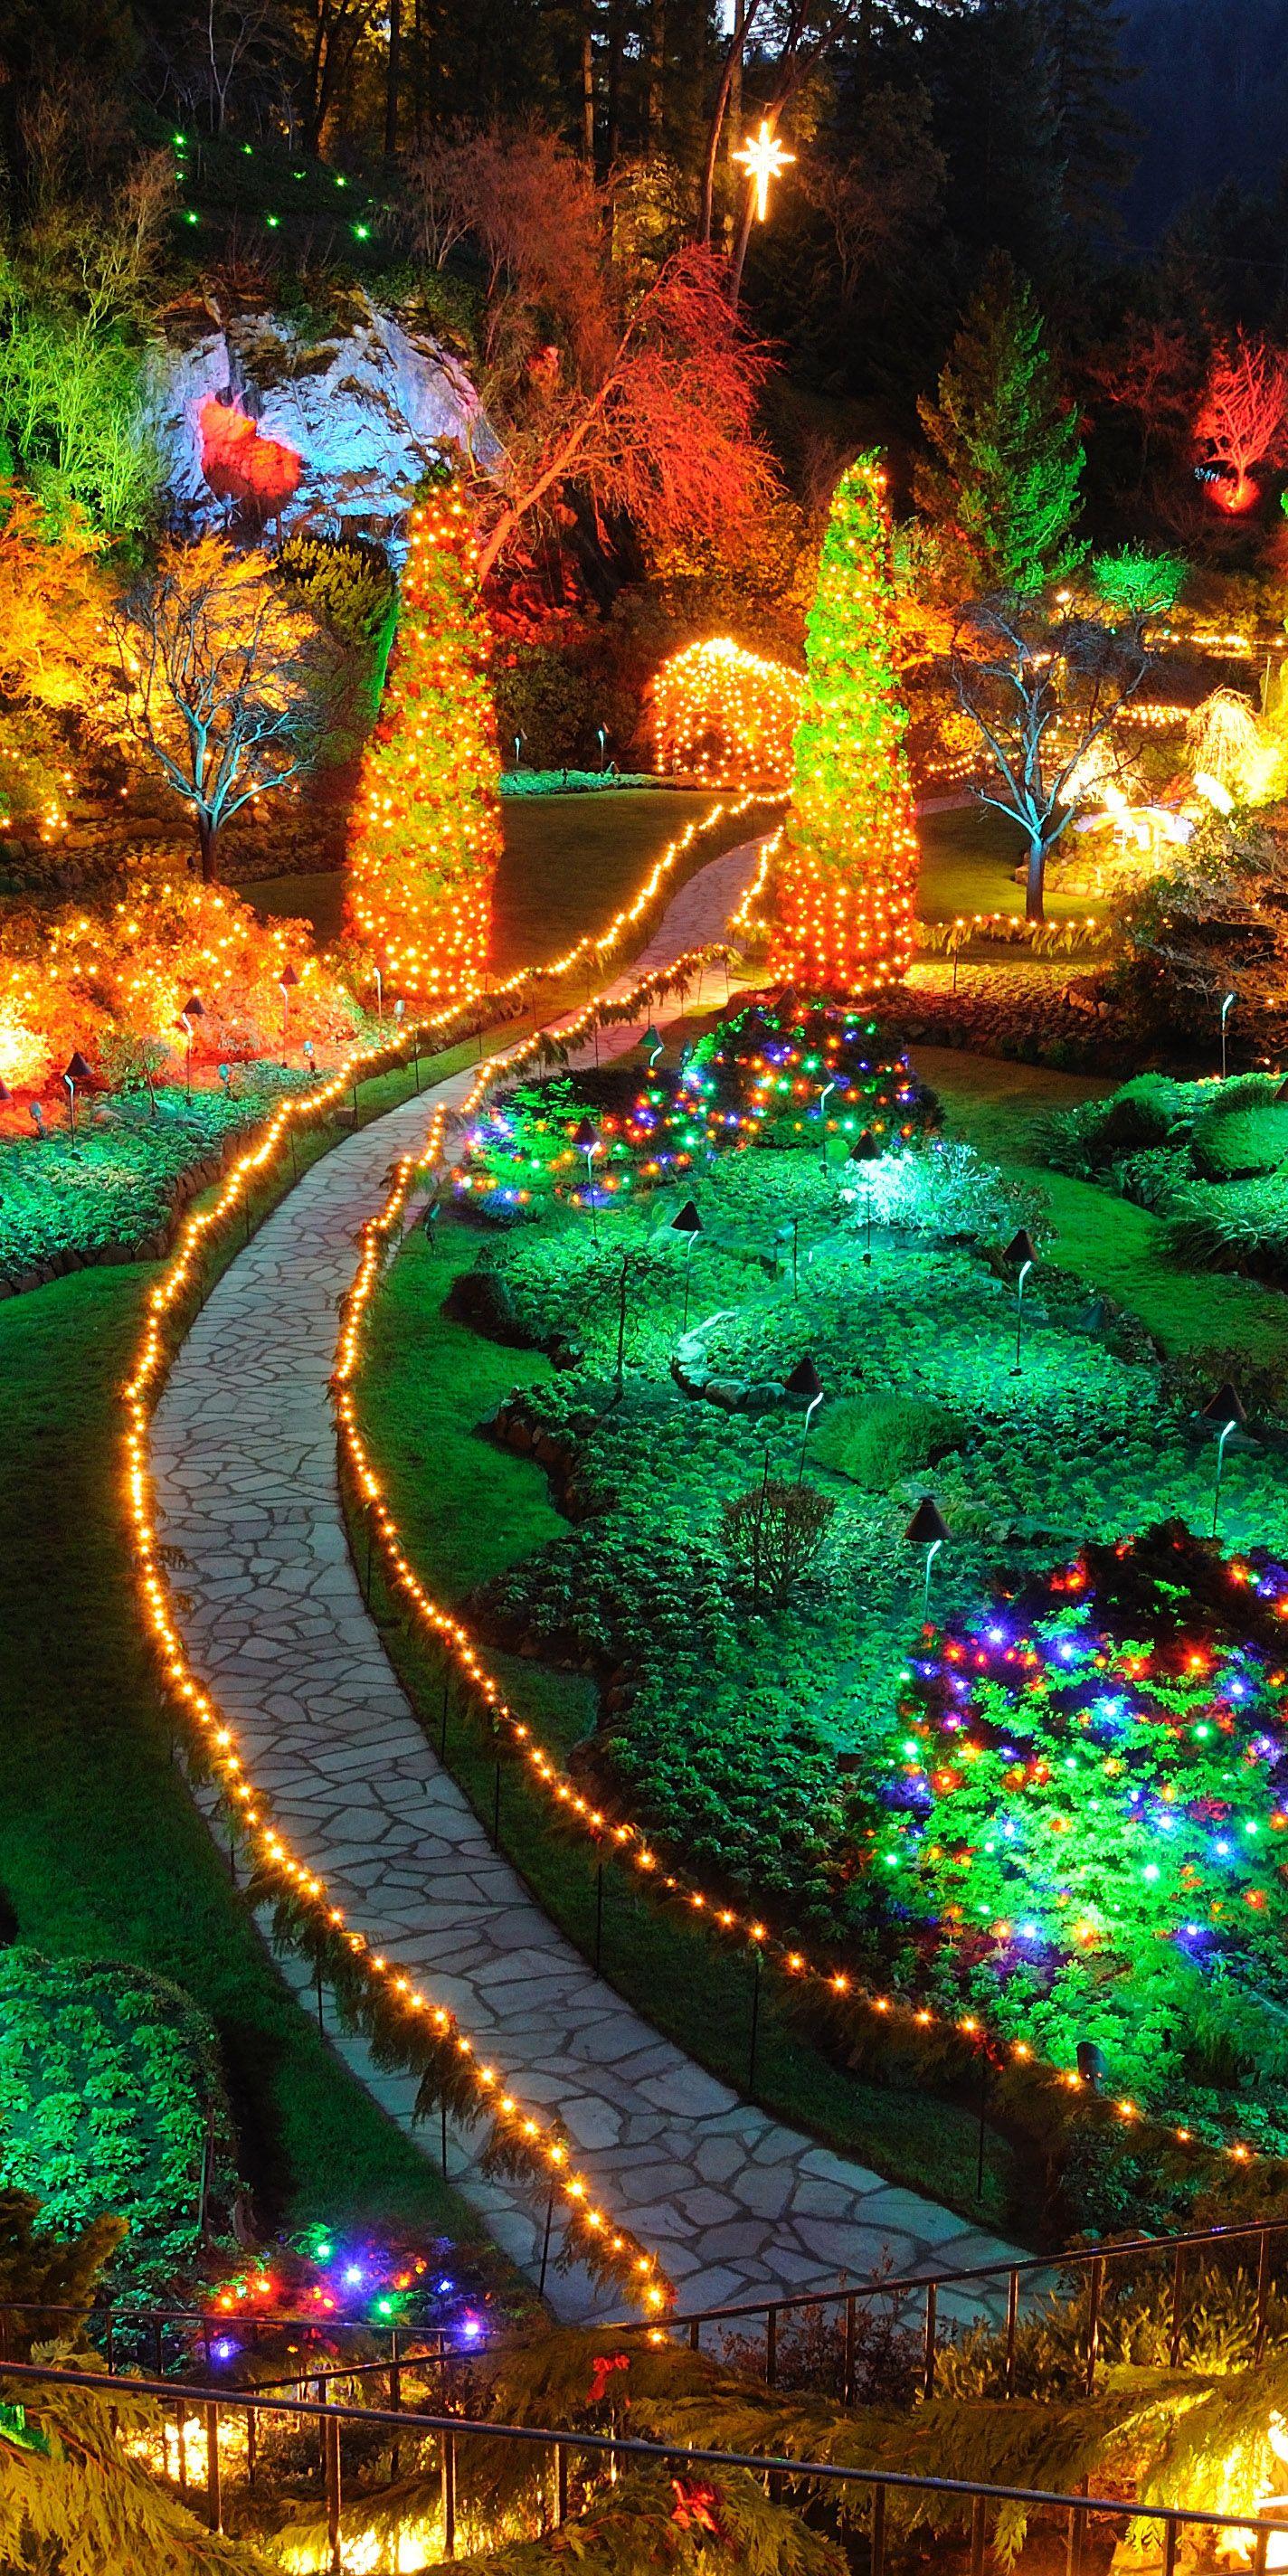 8bdb633b4dd56820fffee4483fd0e257 - The Butchart Gardens Christmas Lights Tour